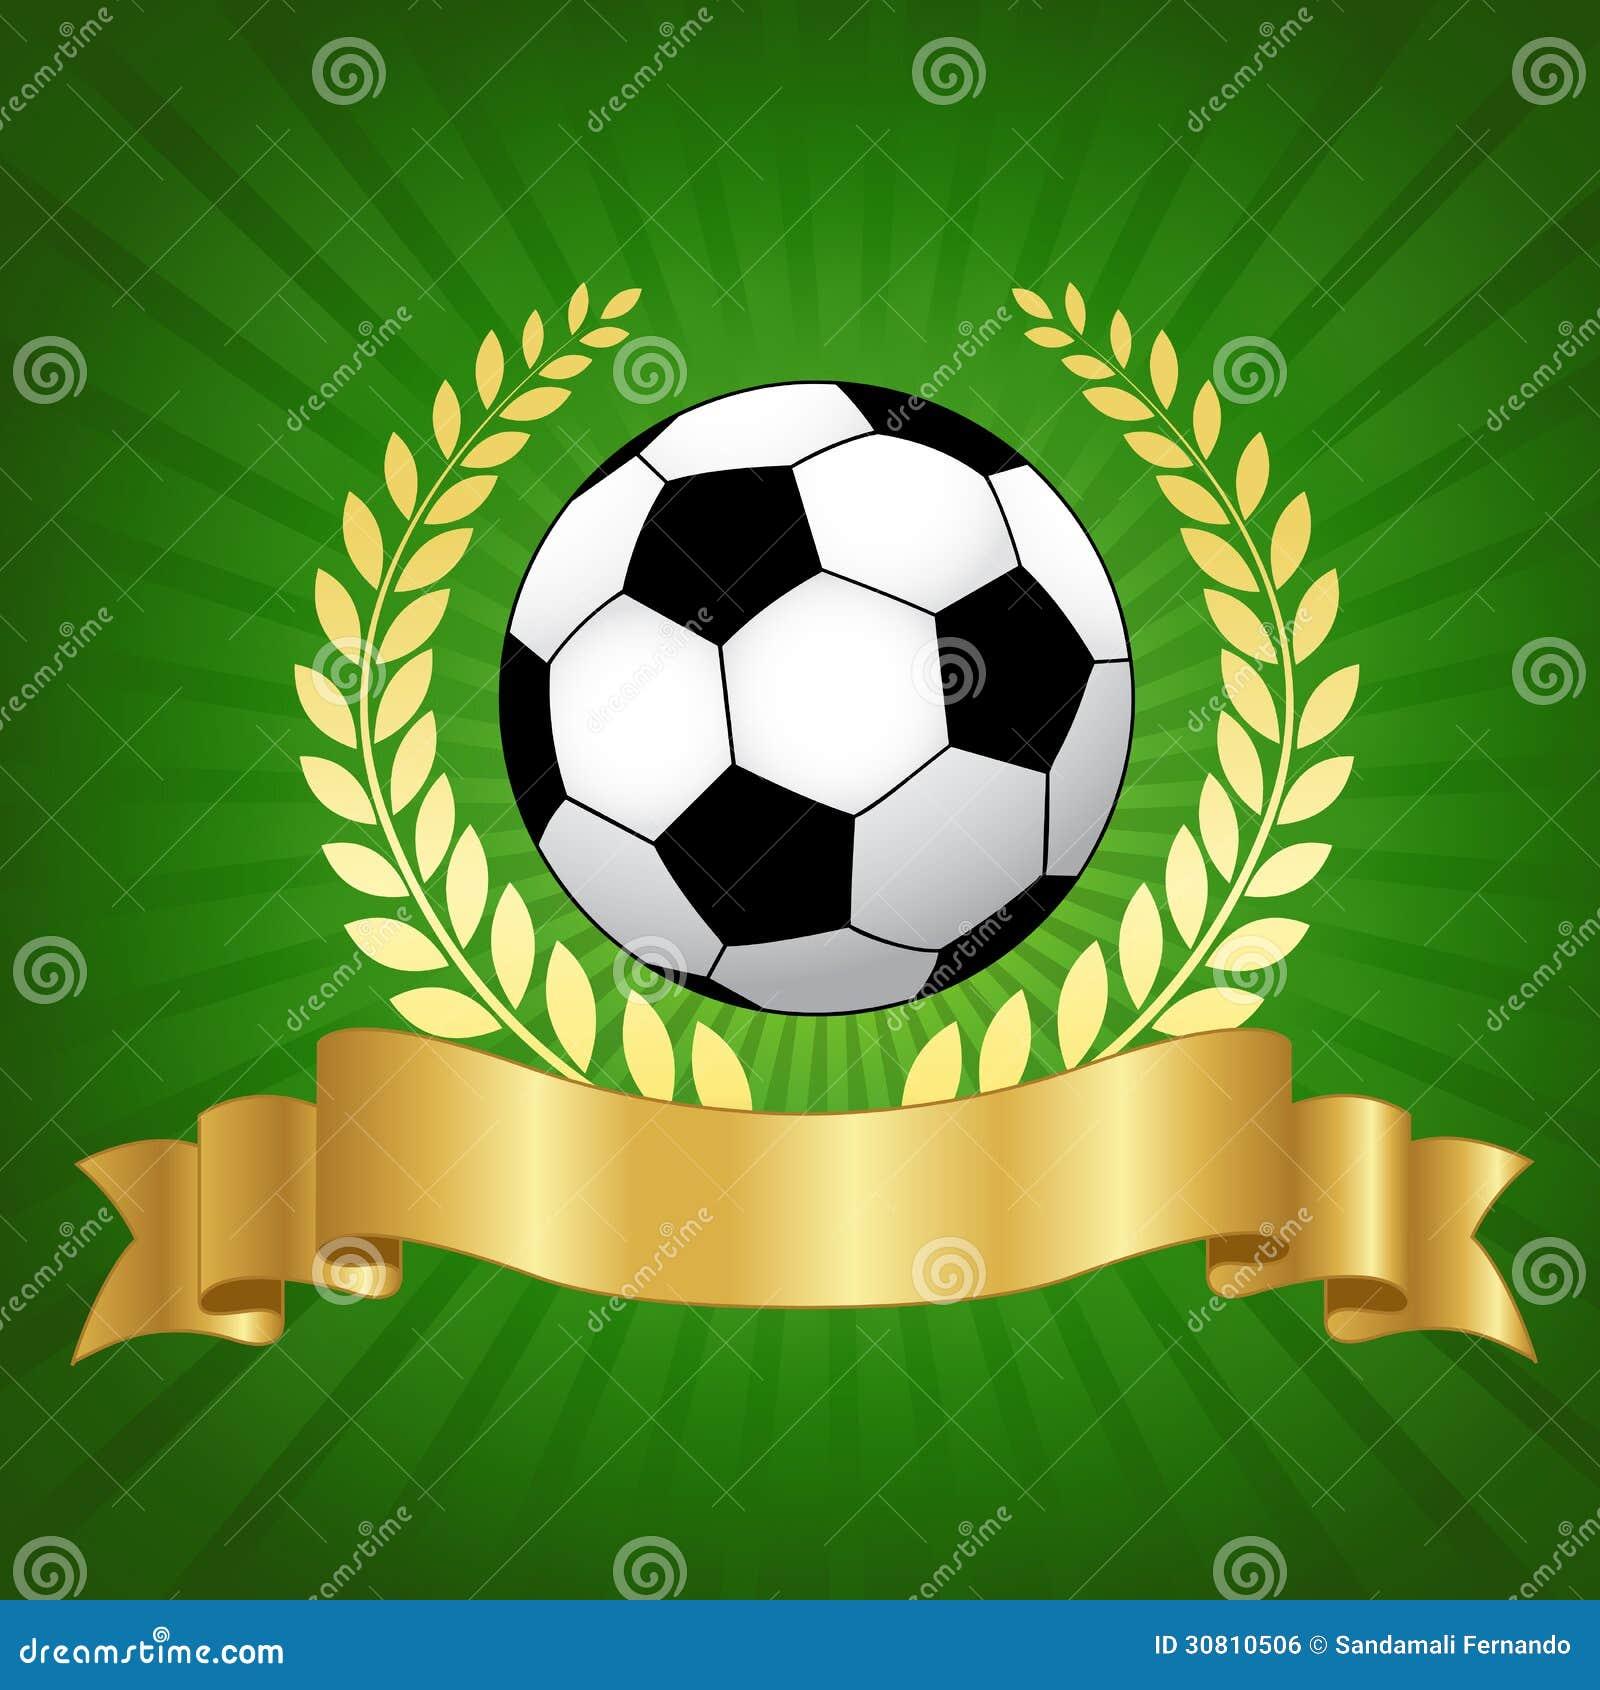 chanpion soccer